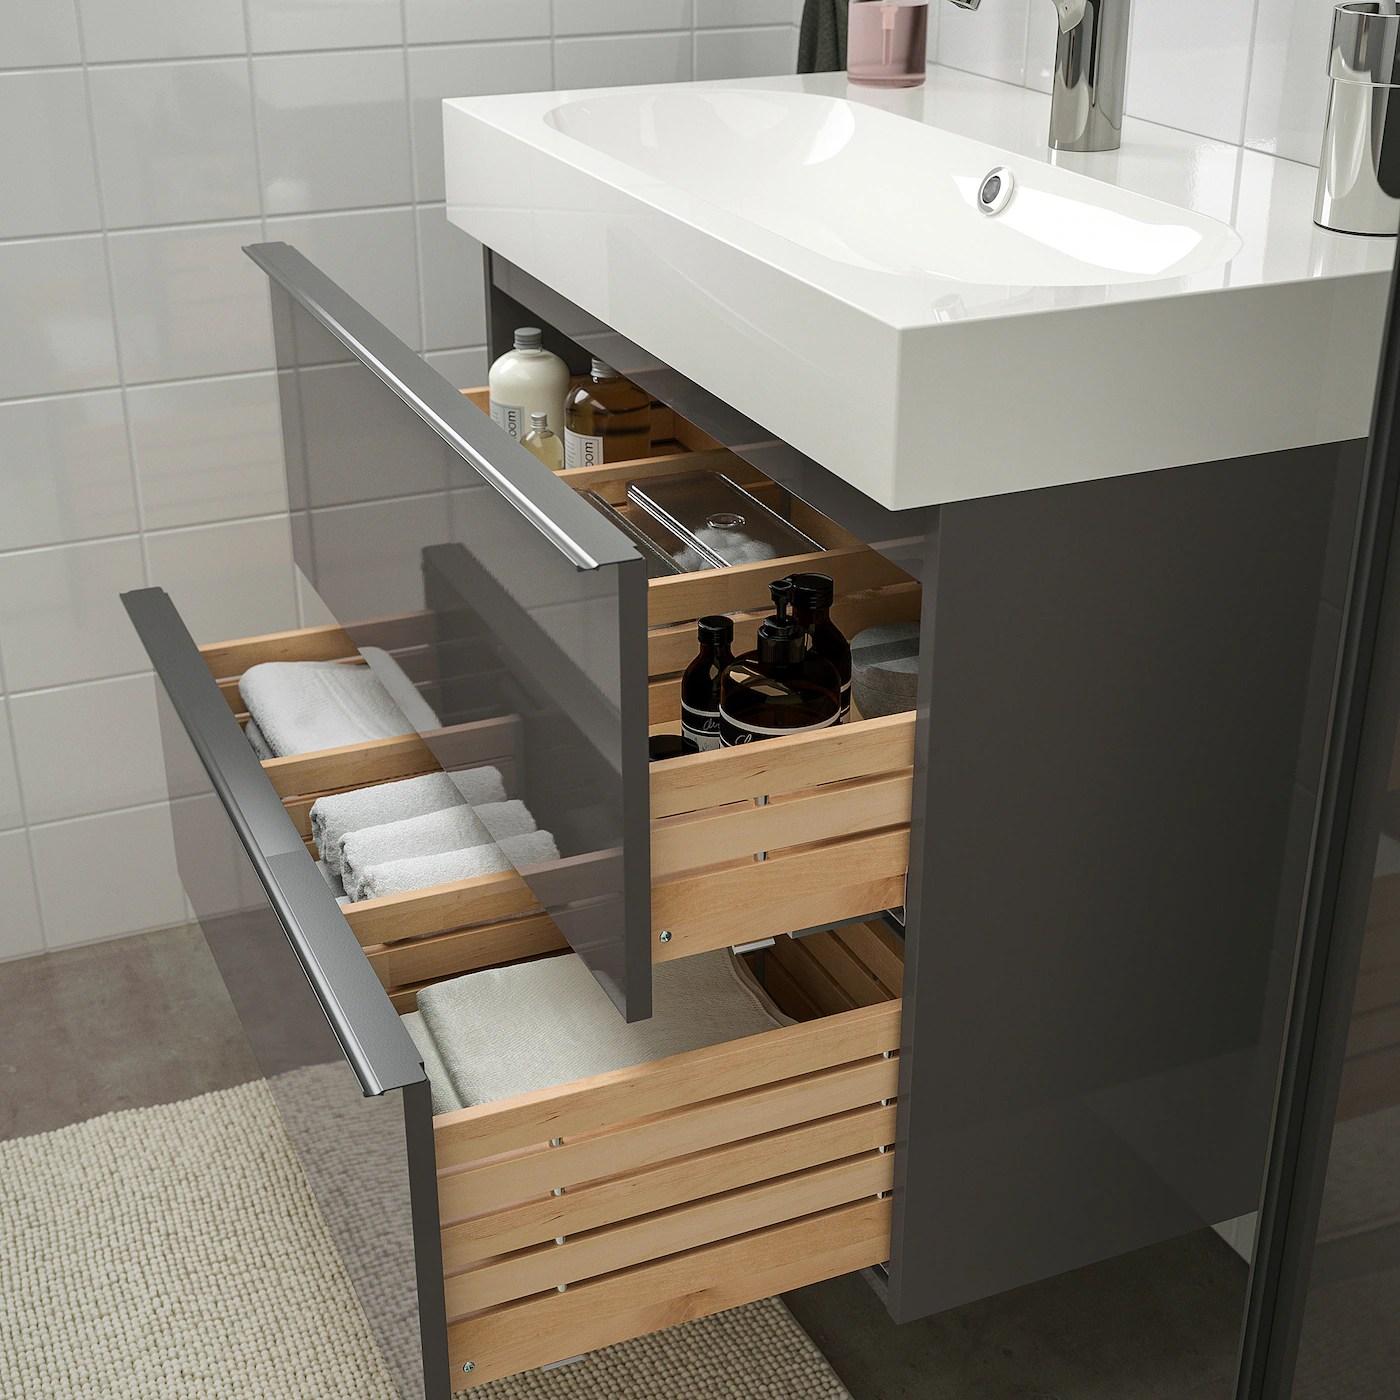 godmorgon braviken mobilier salle de bain 5 pieces brillant gris mitigeur lavabo brogrund 80 cm